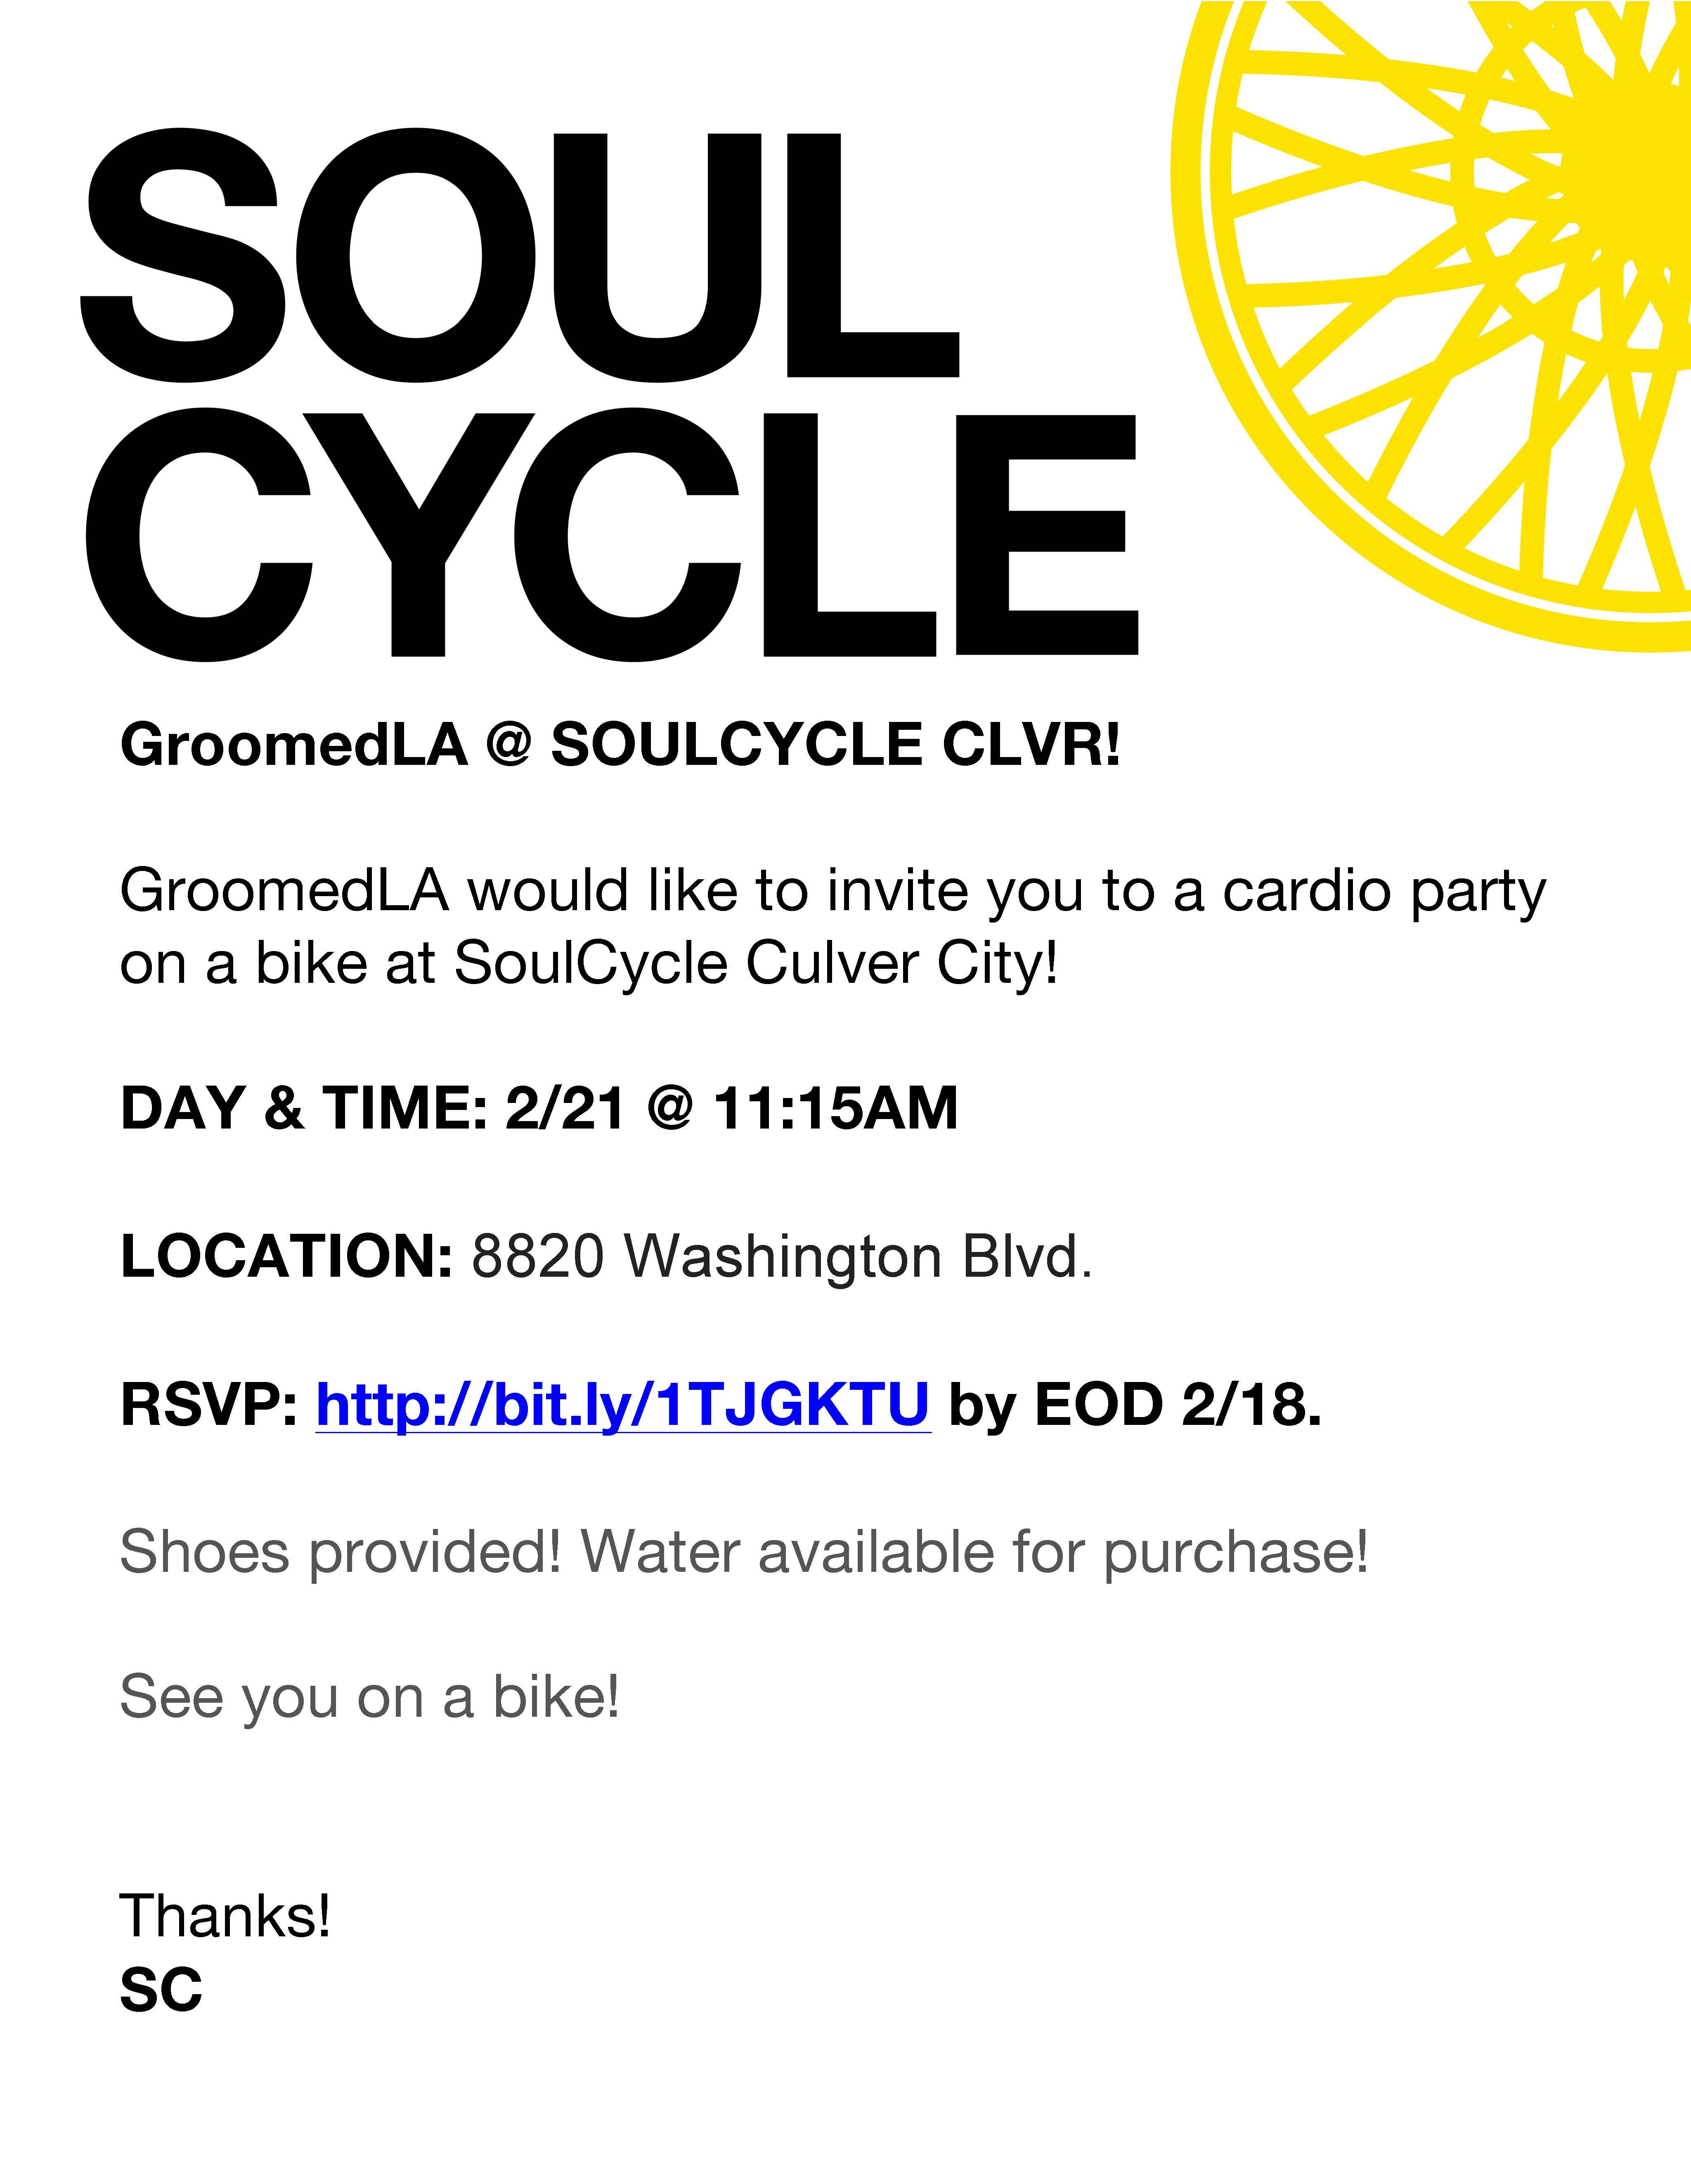 GroomedLA Invite